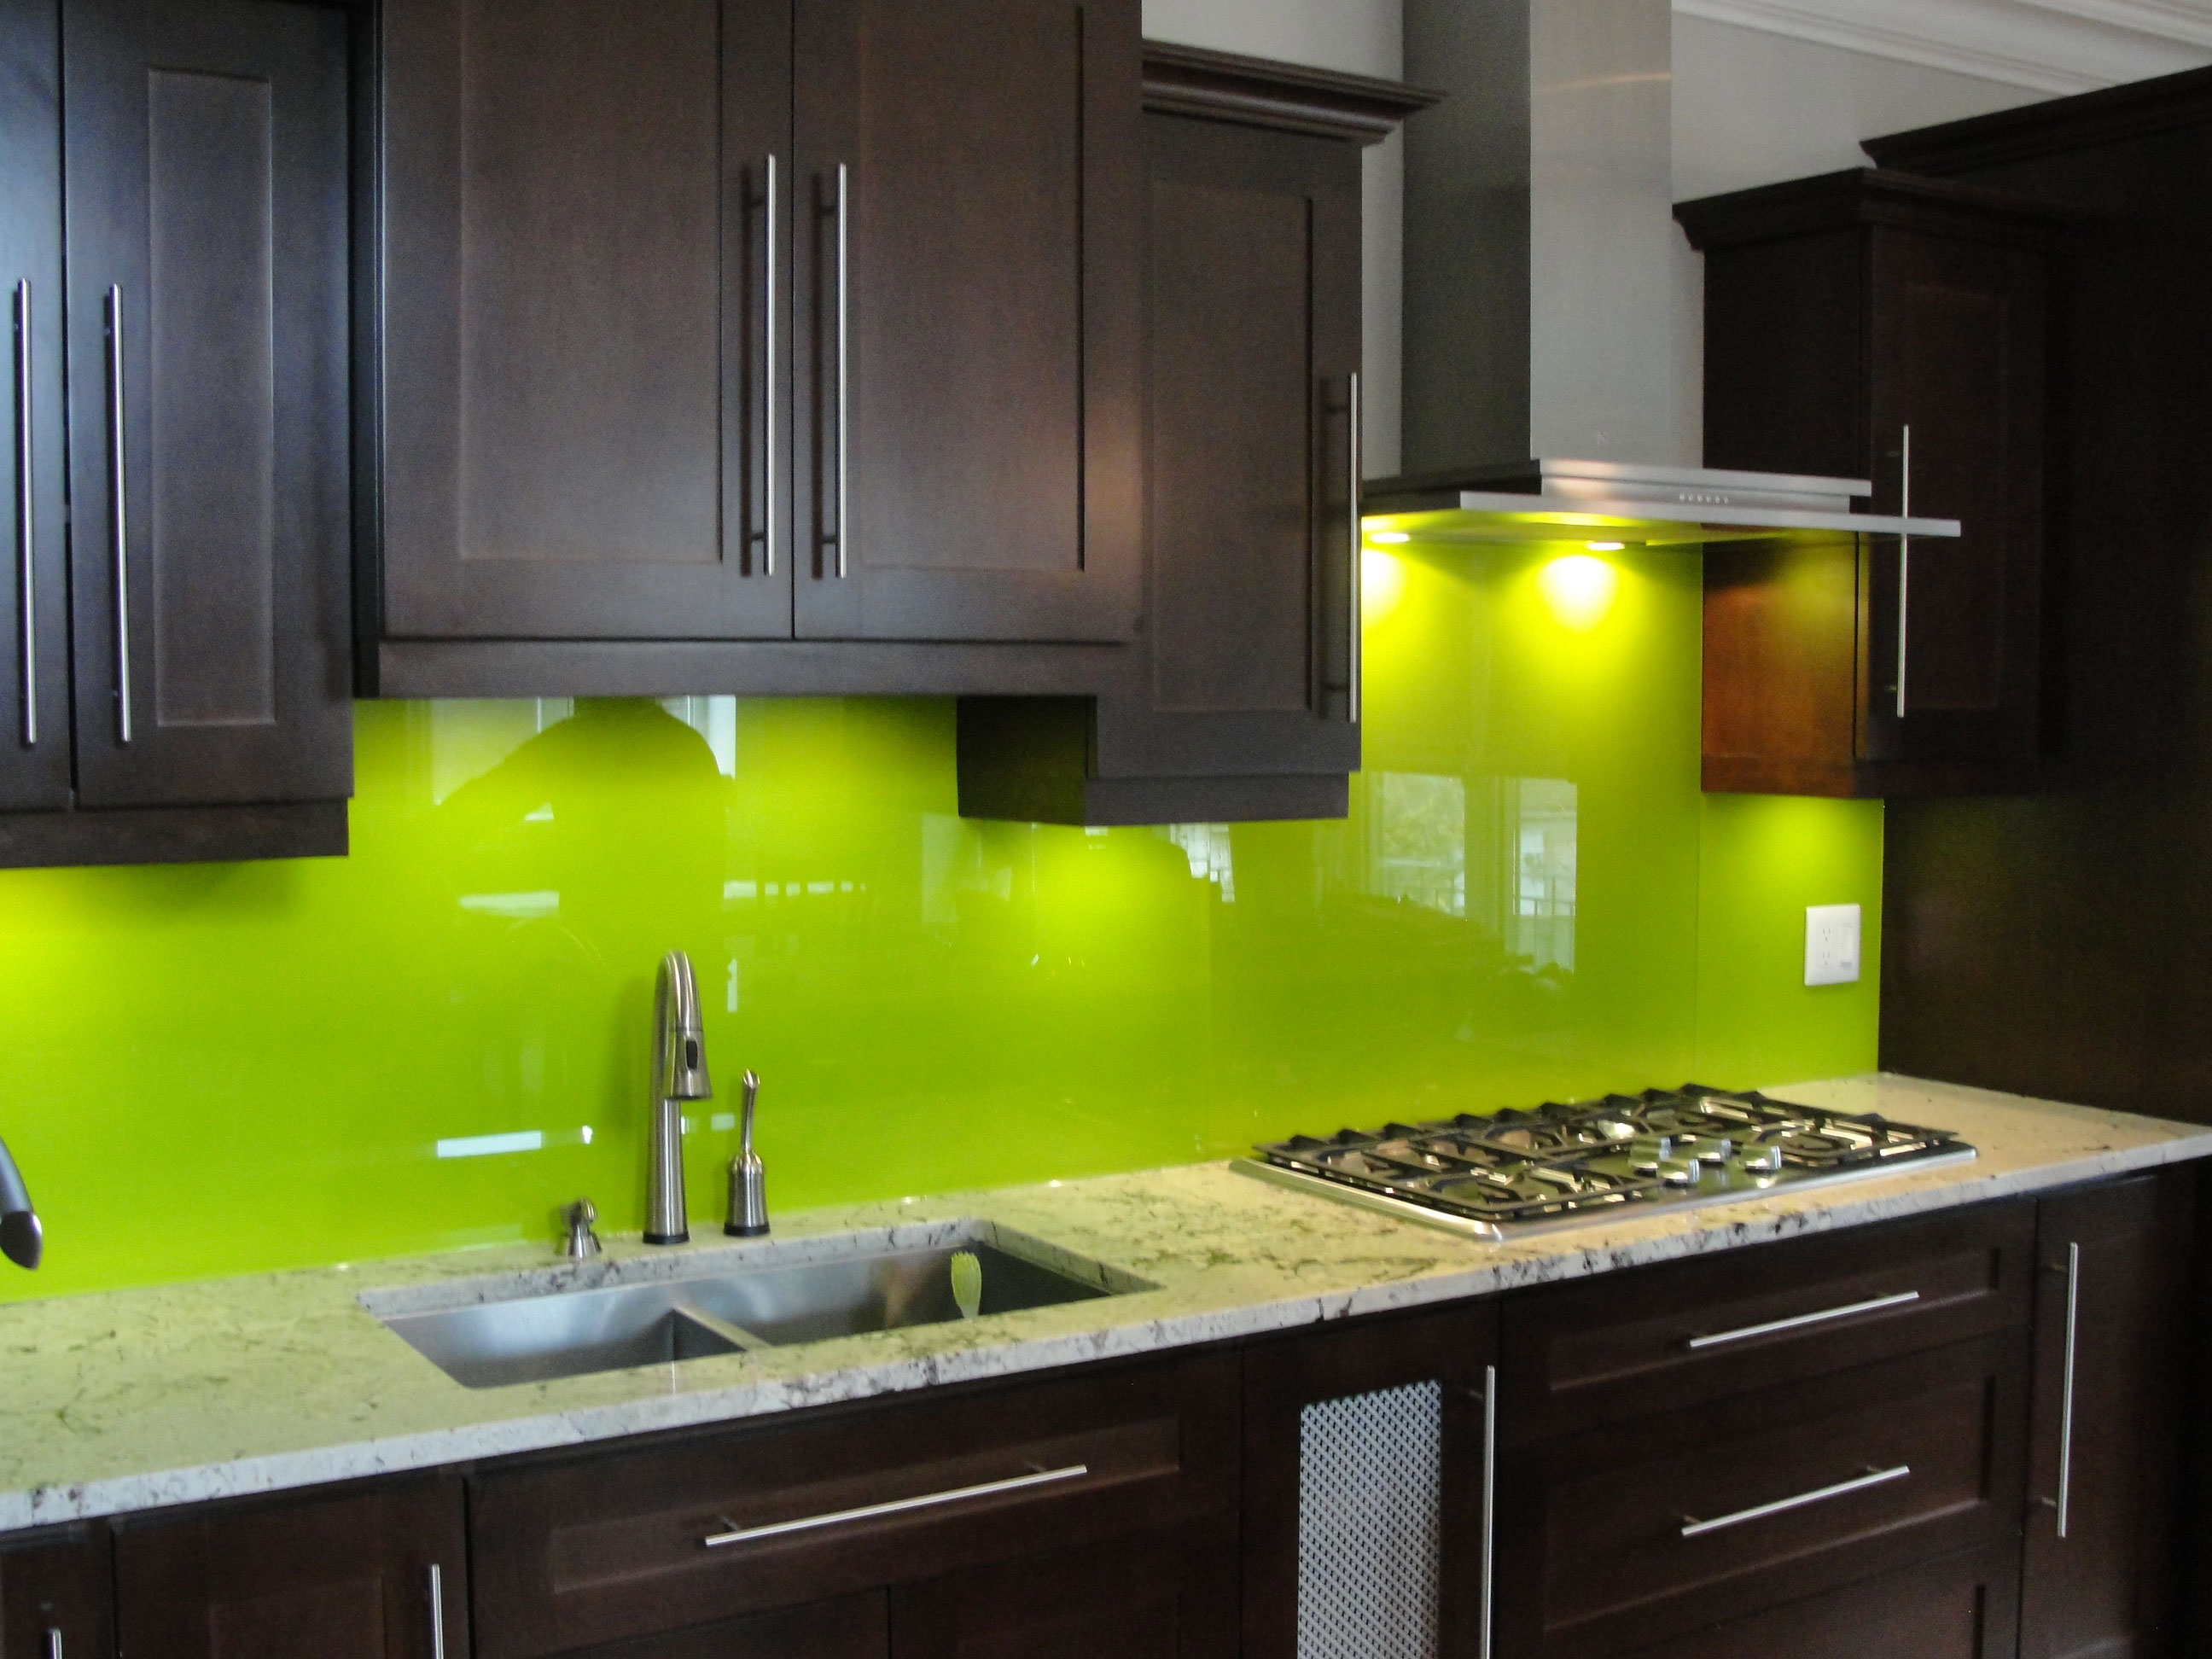 painted glass kitchen backsplash couchable kitchen backsplash colorful painted diy kitchen backsplash kitchen